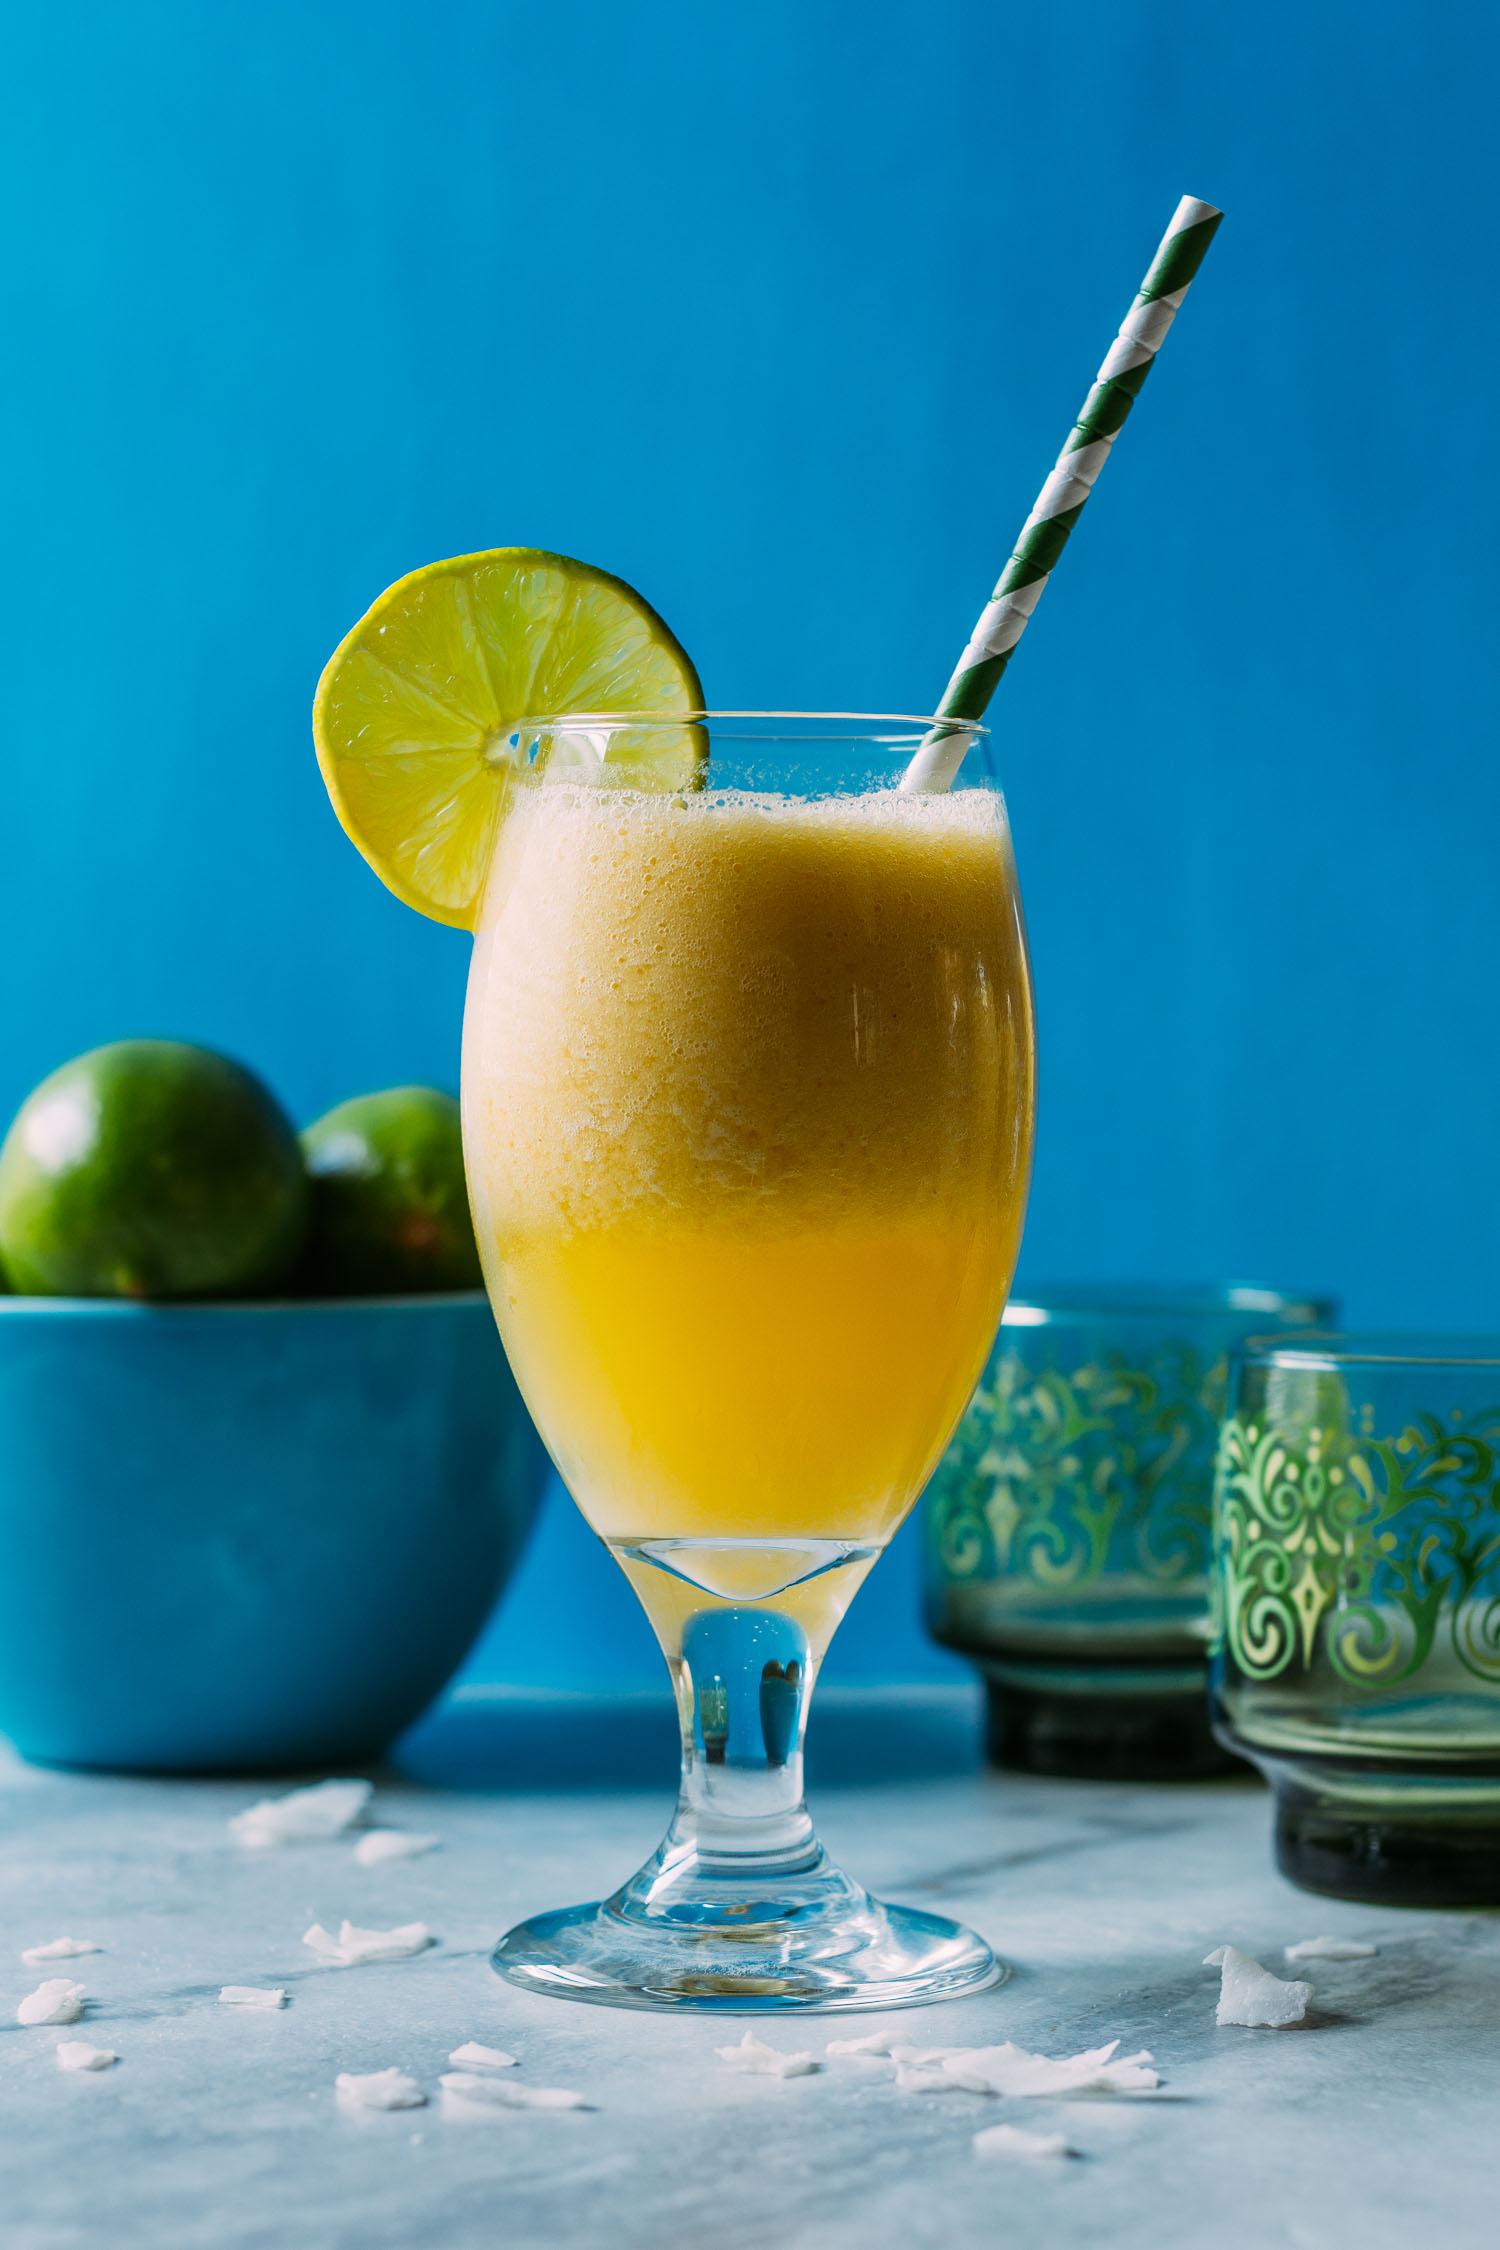 Refreshingly Lite Pina Colada Mango Smoothie #vegan #party #low calorie #beverage #fruit